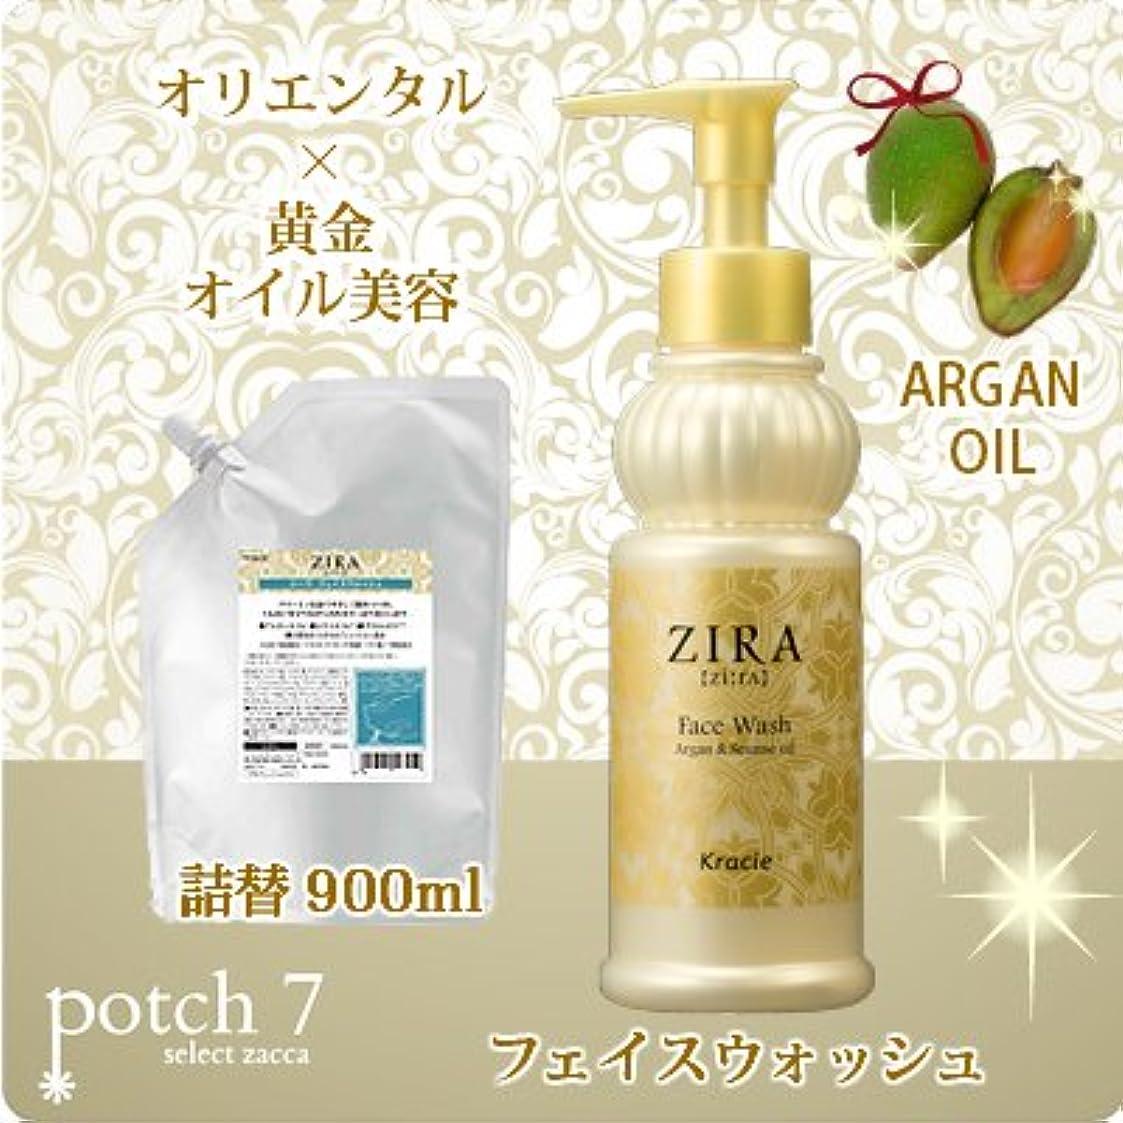 kracie(クラシエ) ZIRA ジーラ フェイスウオッシュ 洗顔 900ml 業務用サイズ 詰替え 空容器1本付